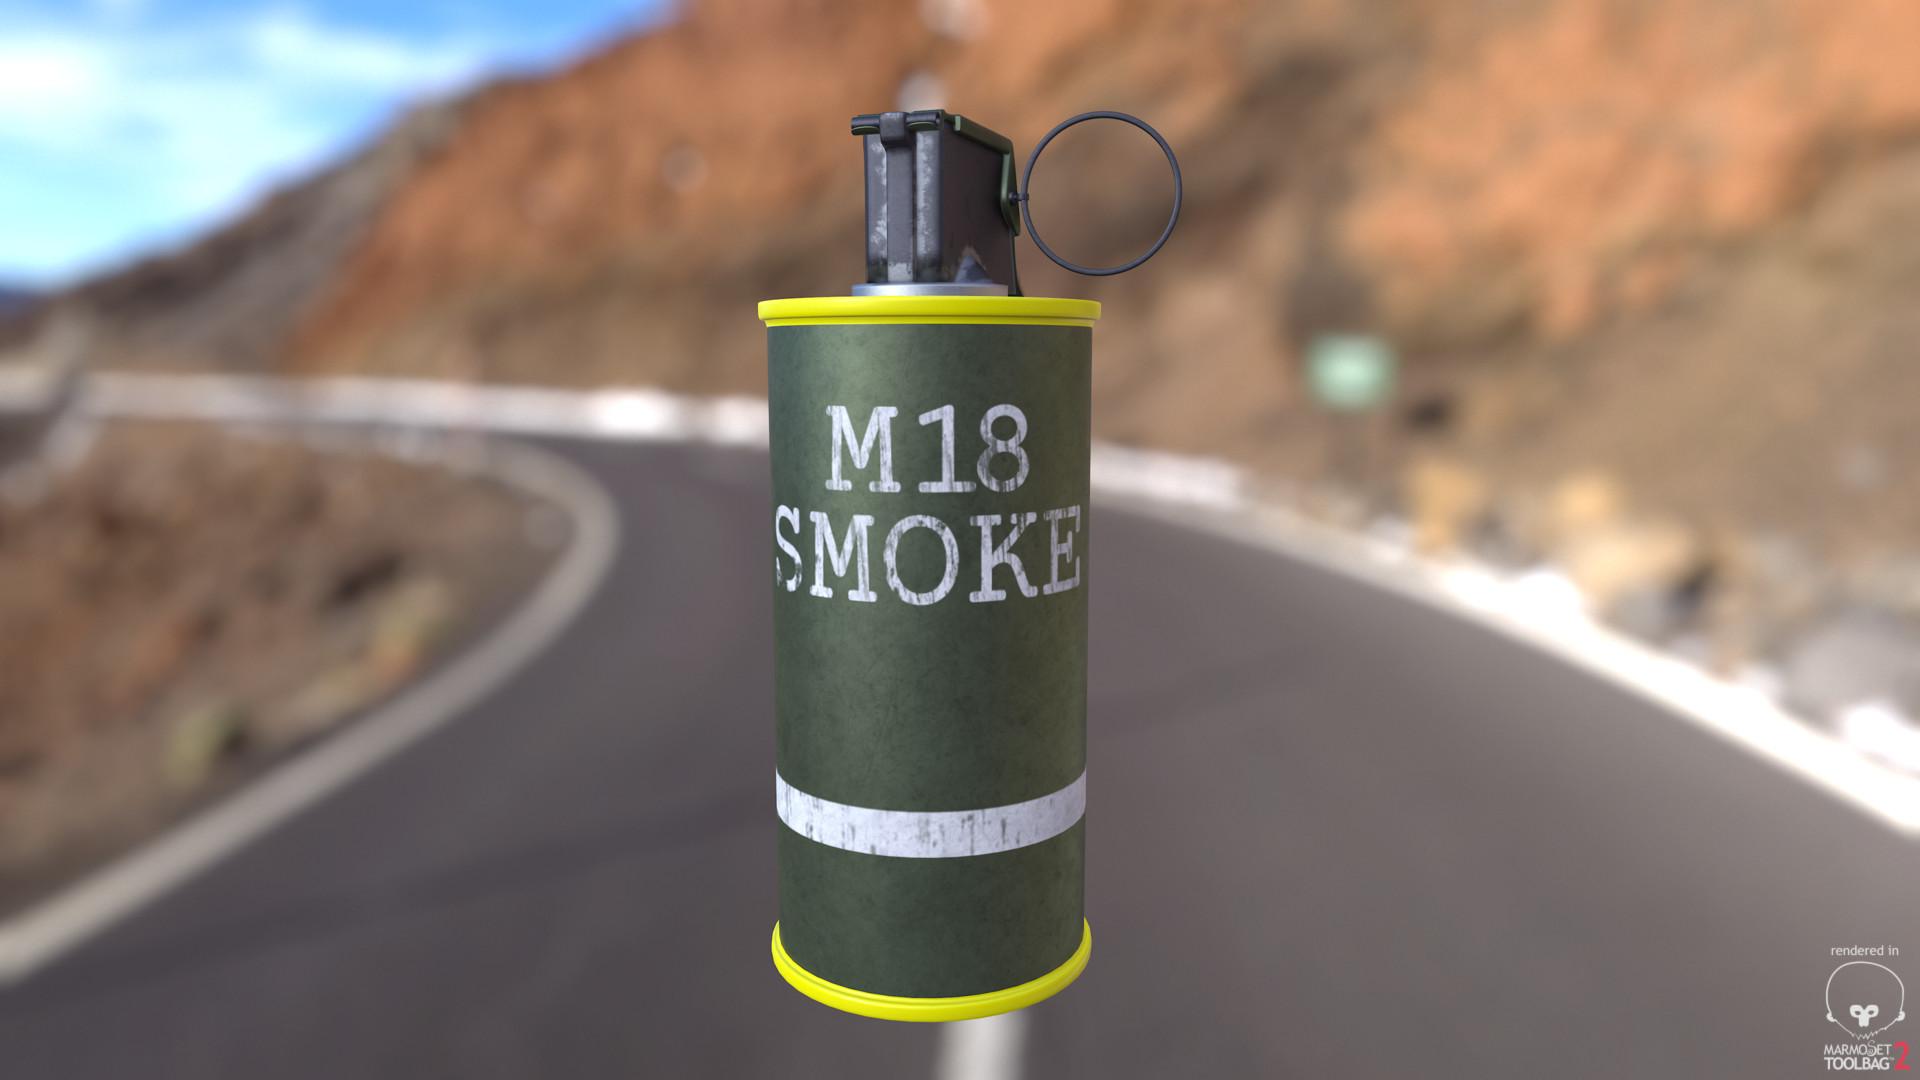 Yentl R  - M18 Smoke Grenade